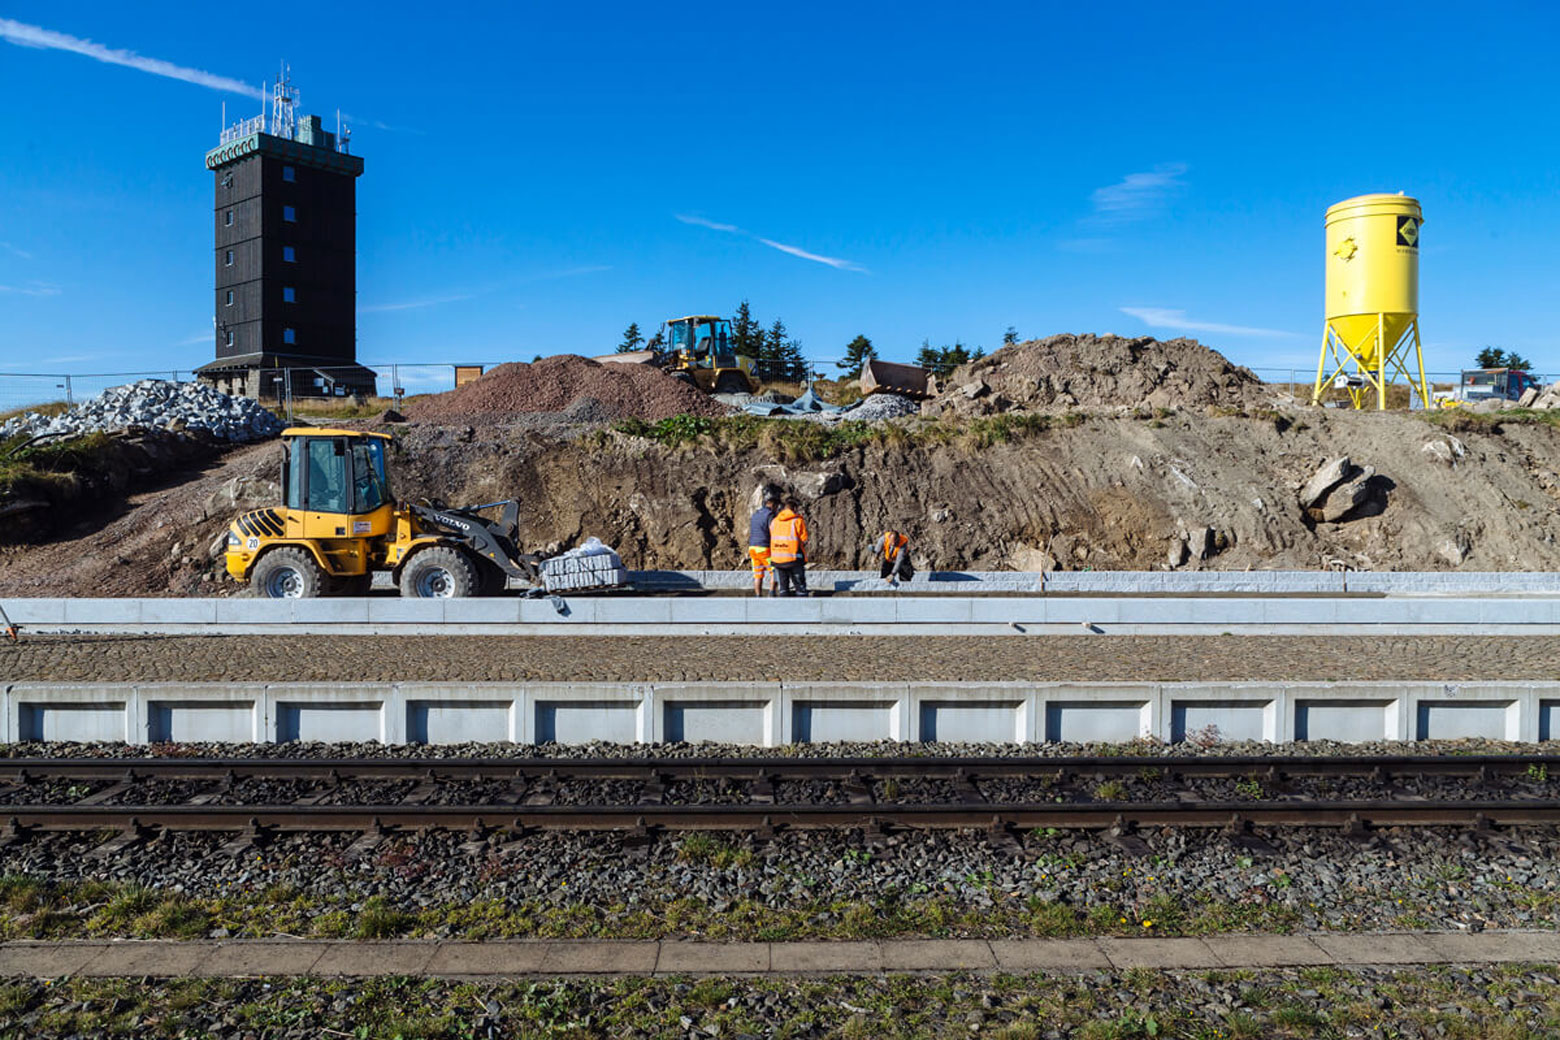 Bauarbeiten mit Bagger vor Hügel